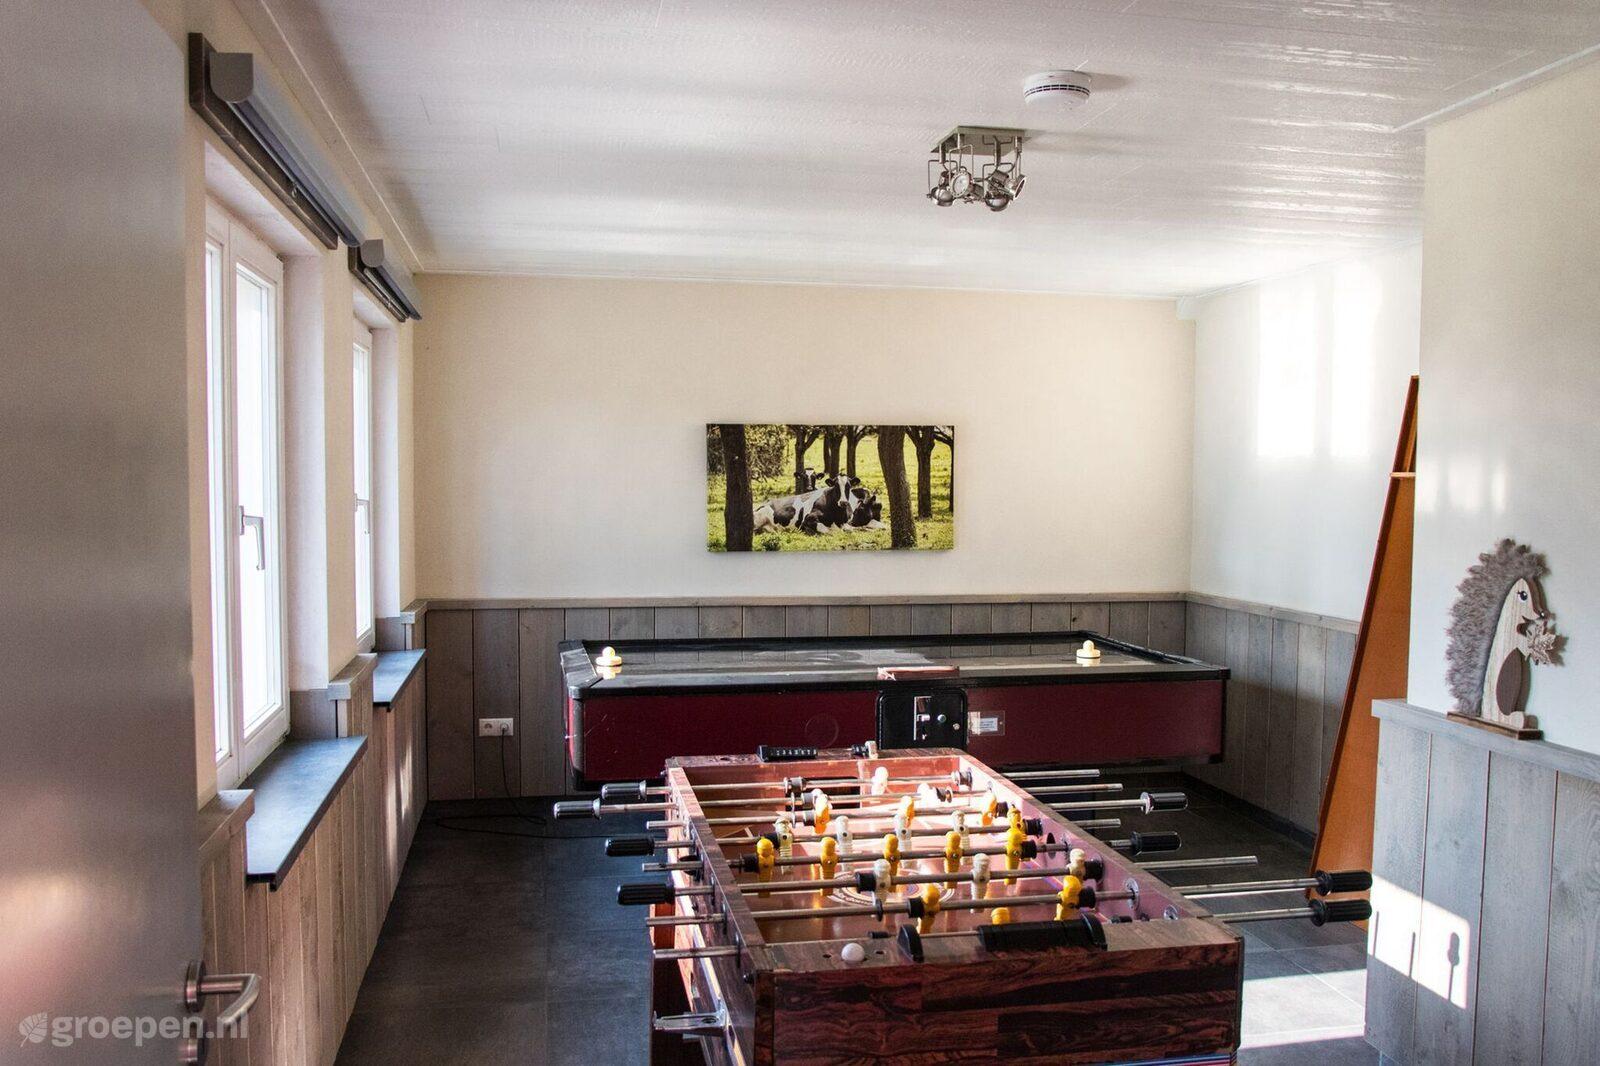 Group accommodation Neerkant